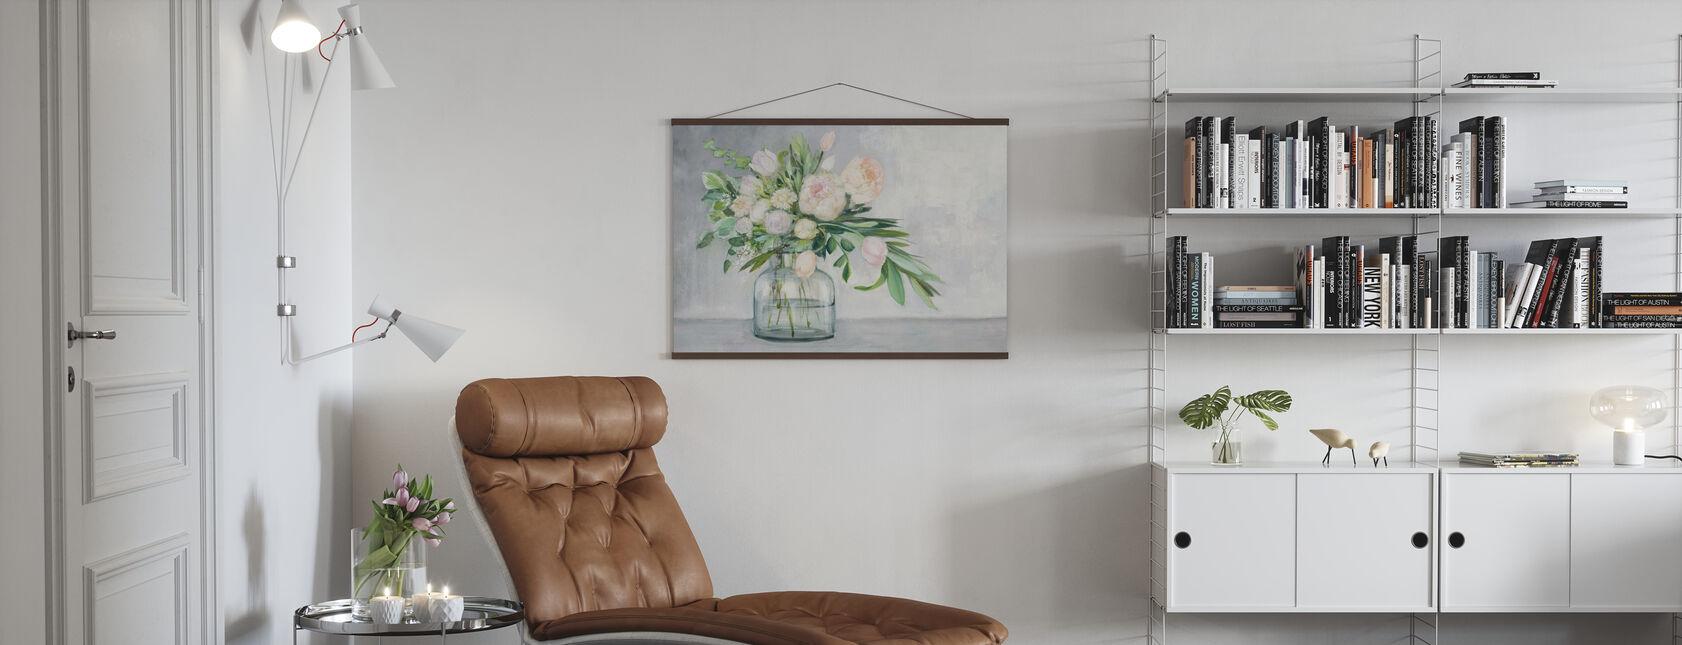 Rouge Frühlingsstrauß - Poster - Wohnzimmer